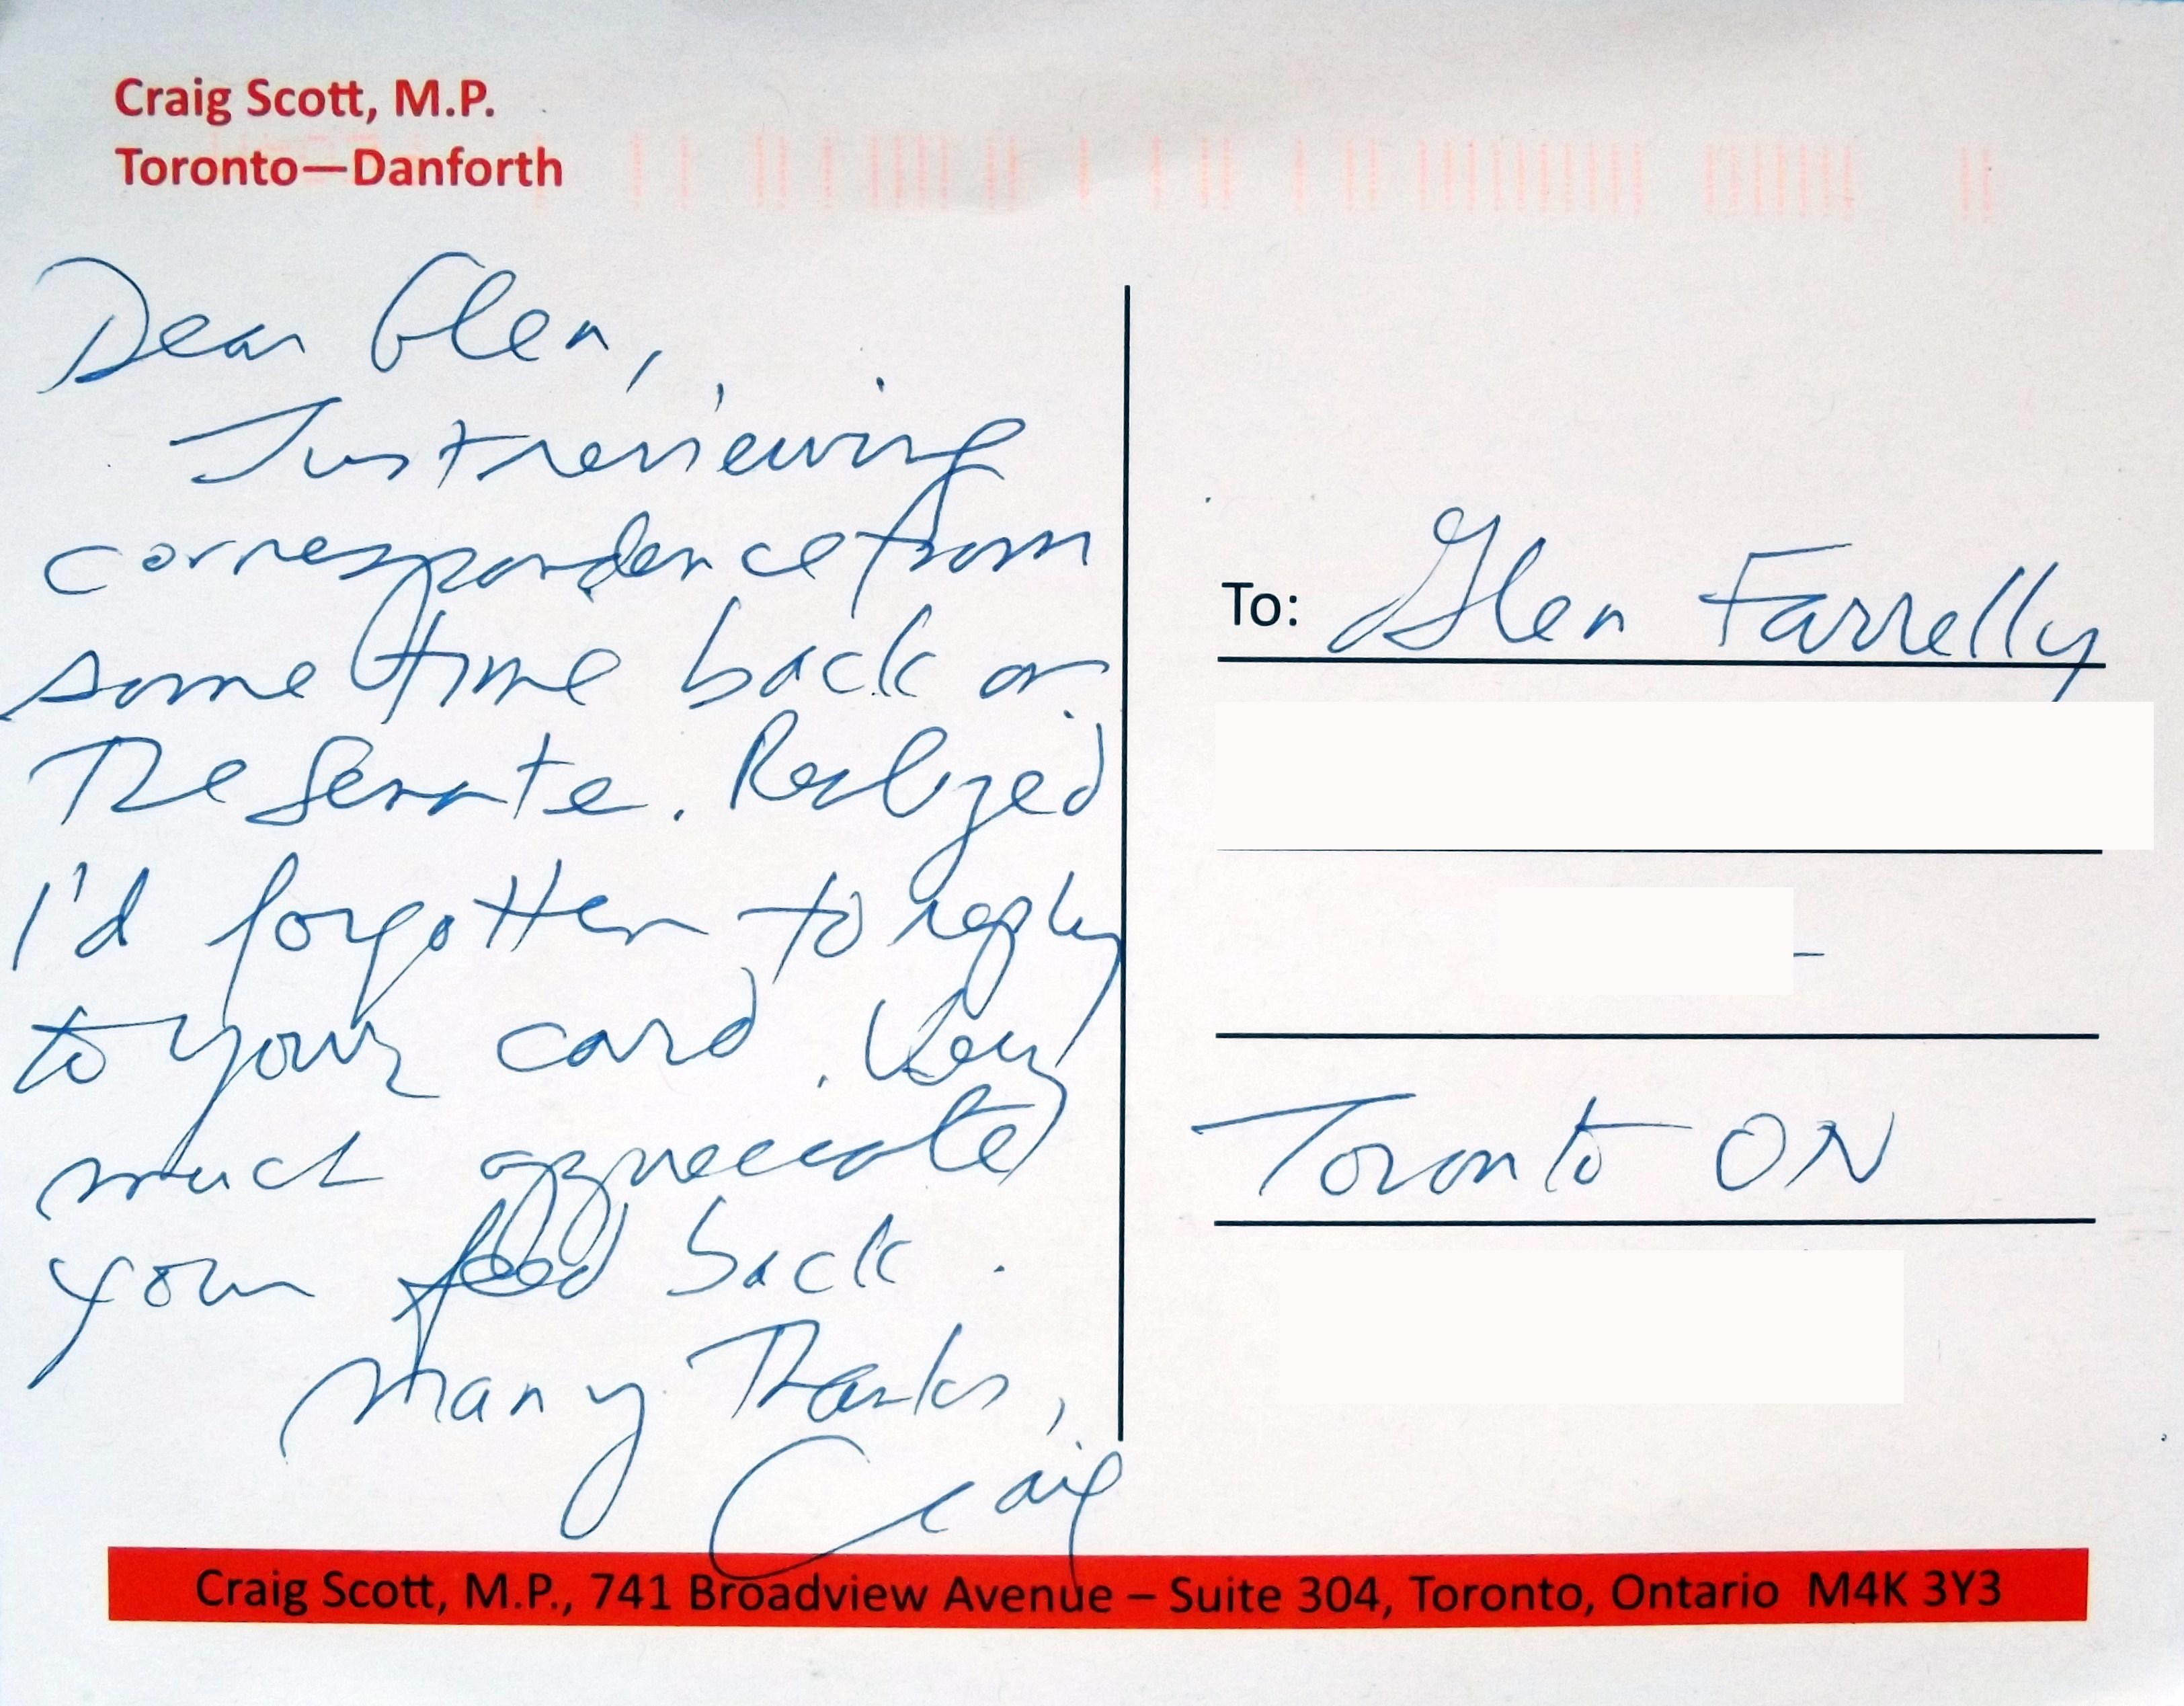 Italian handwritten postcard letter stock photo image 39254147 - Handwritten